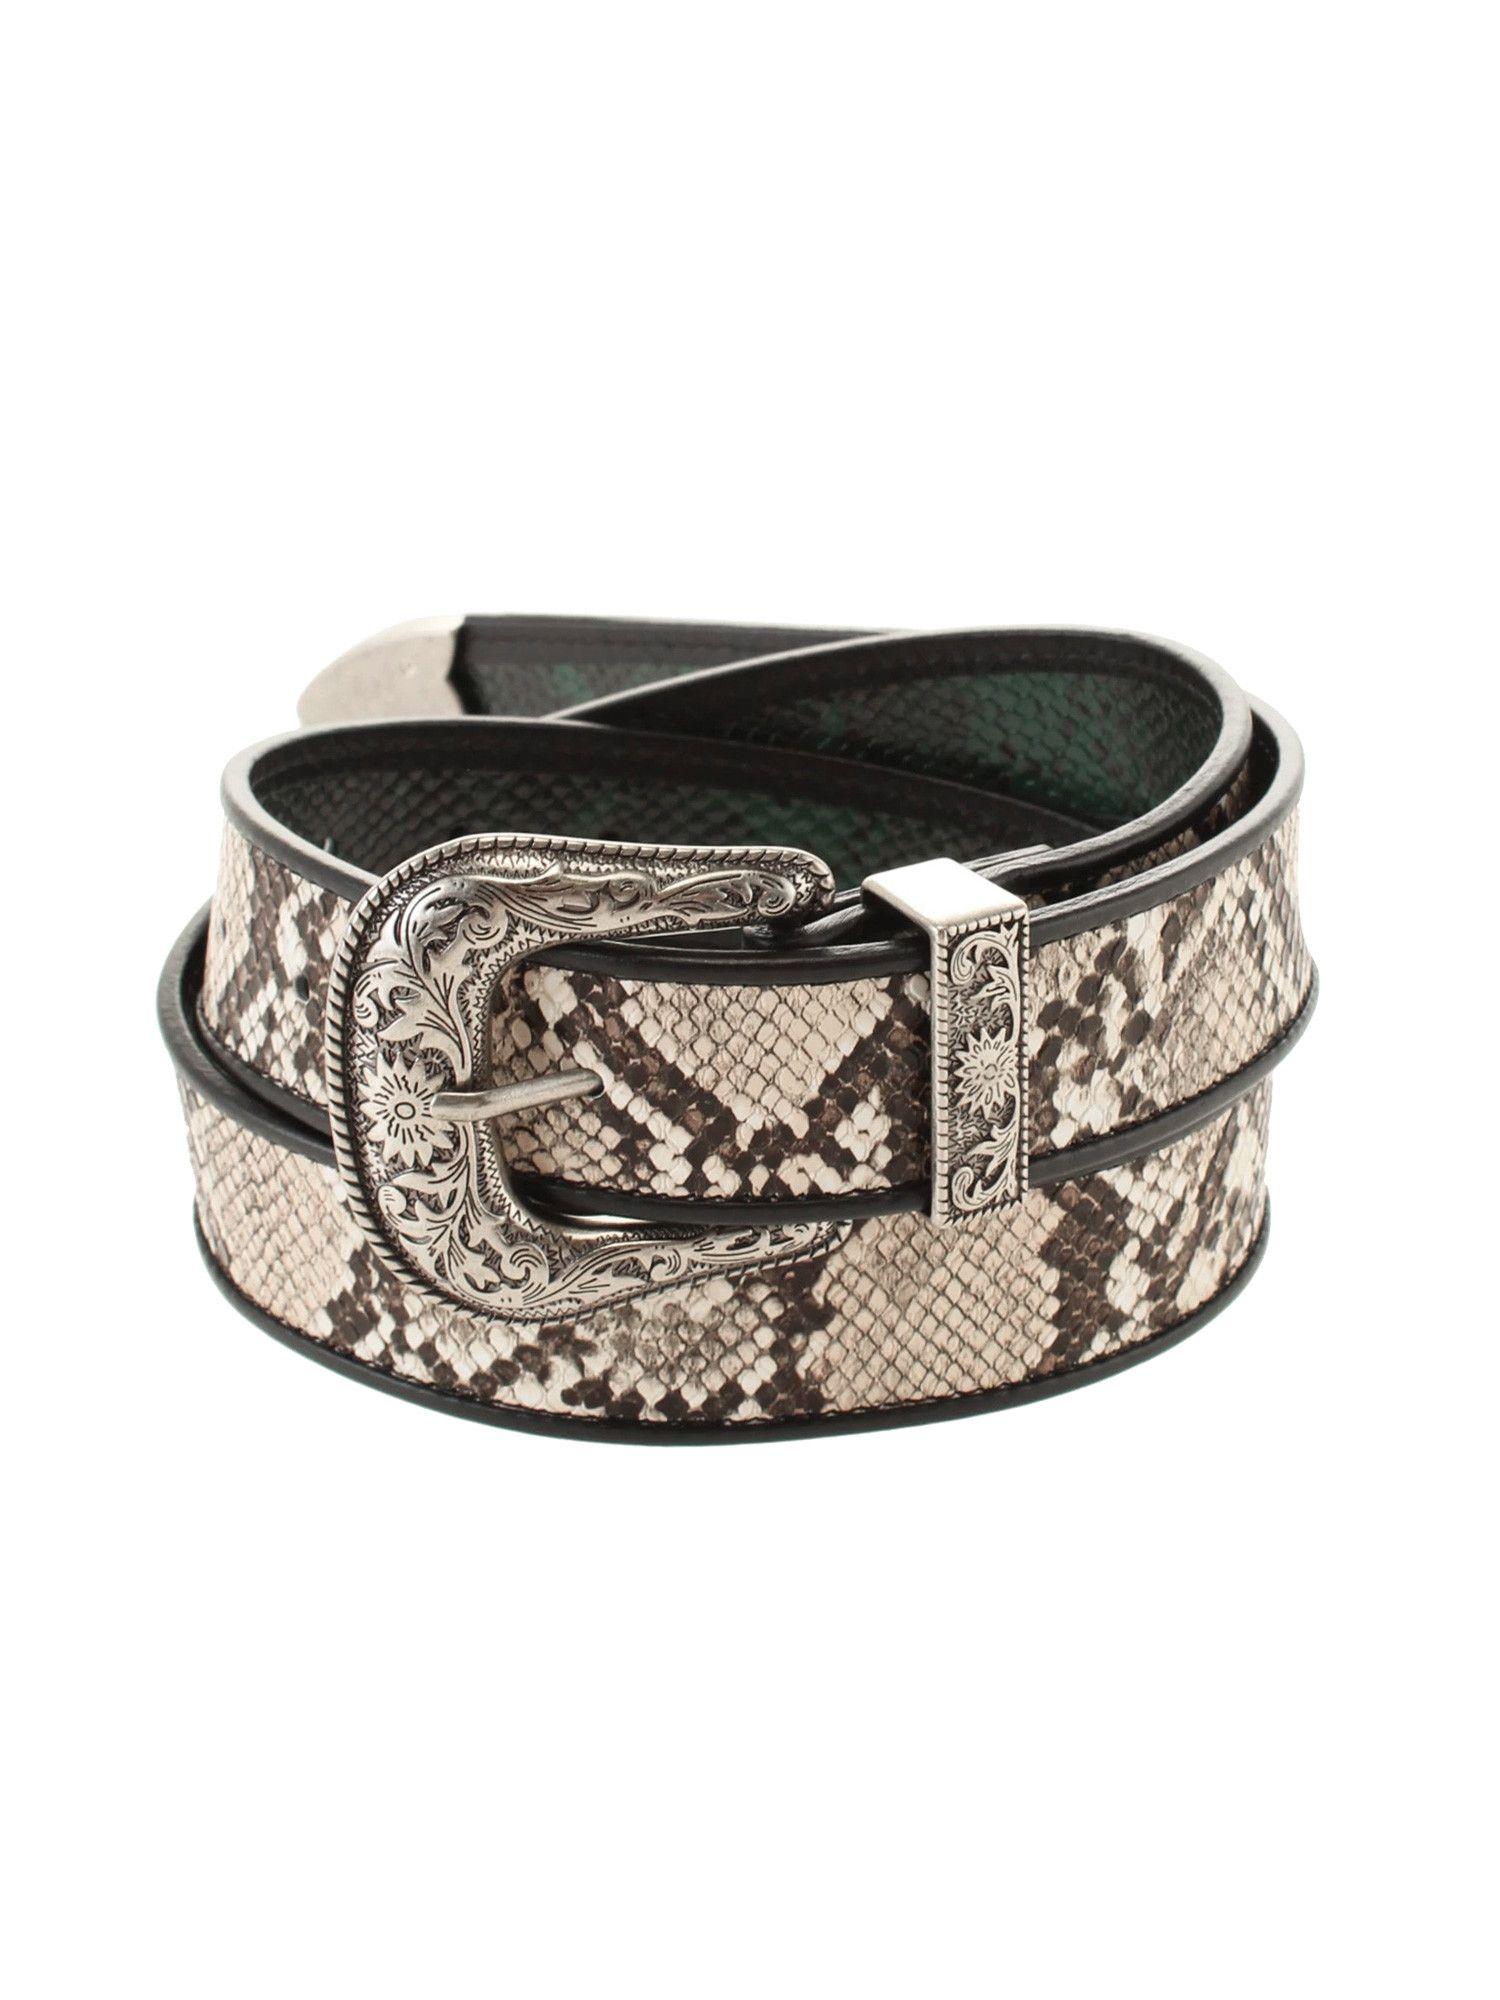 Snakey Belt